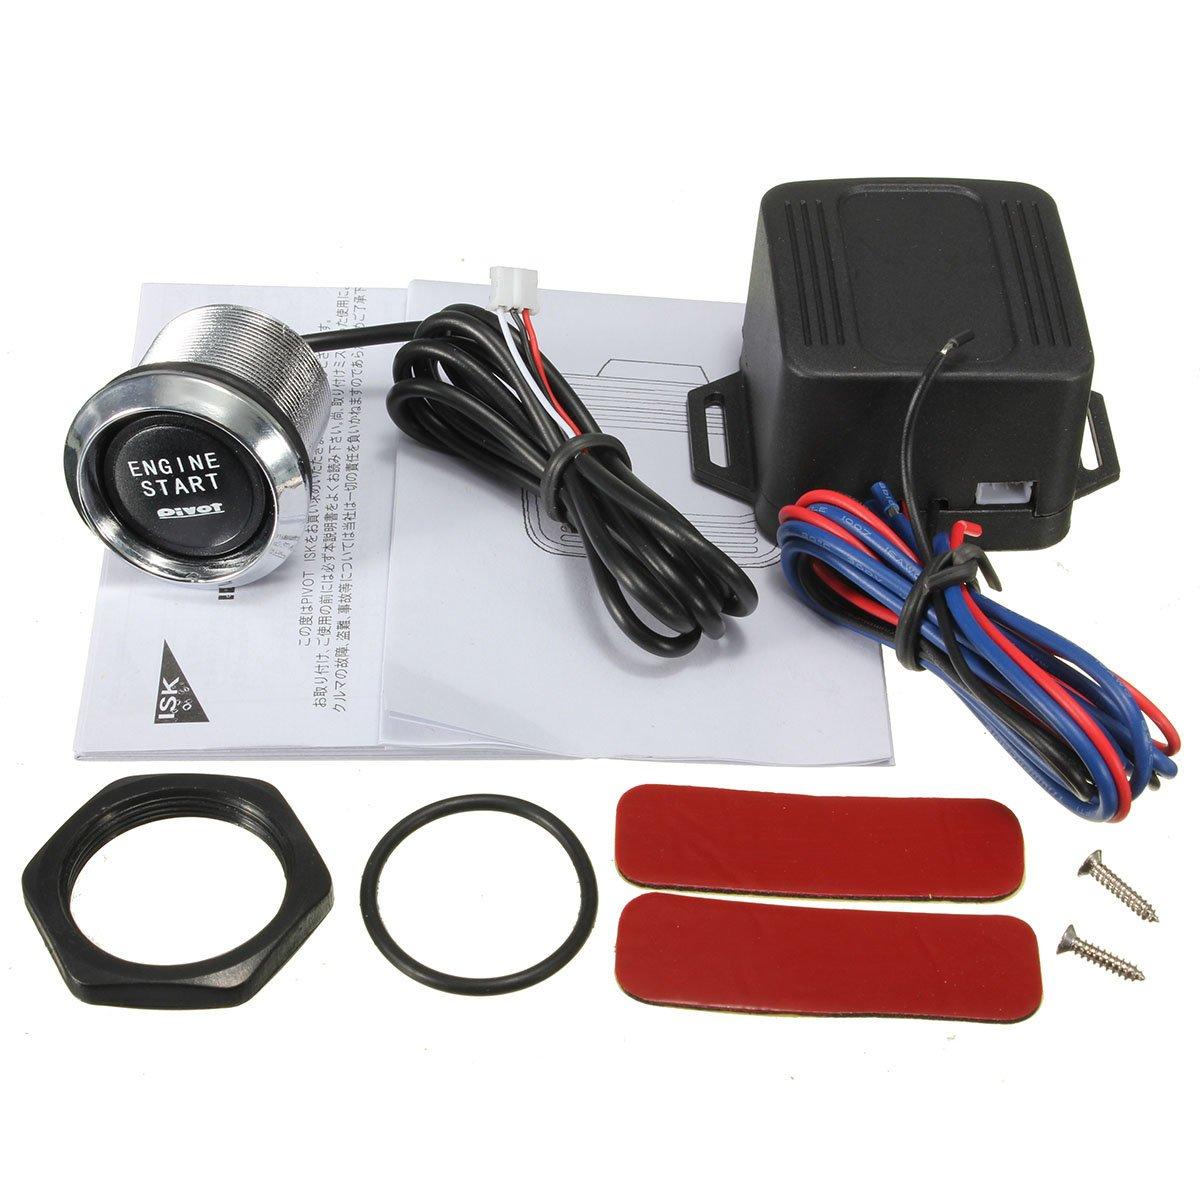 Generic Universal Car Engine Start Push Button Switch Ignition Starter Kit